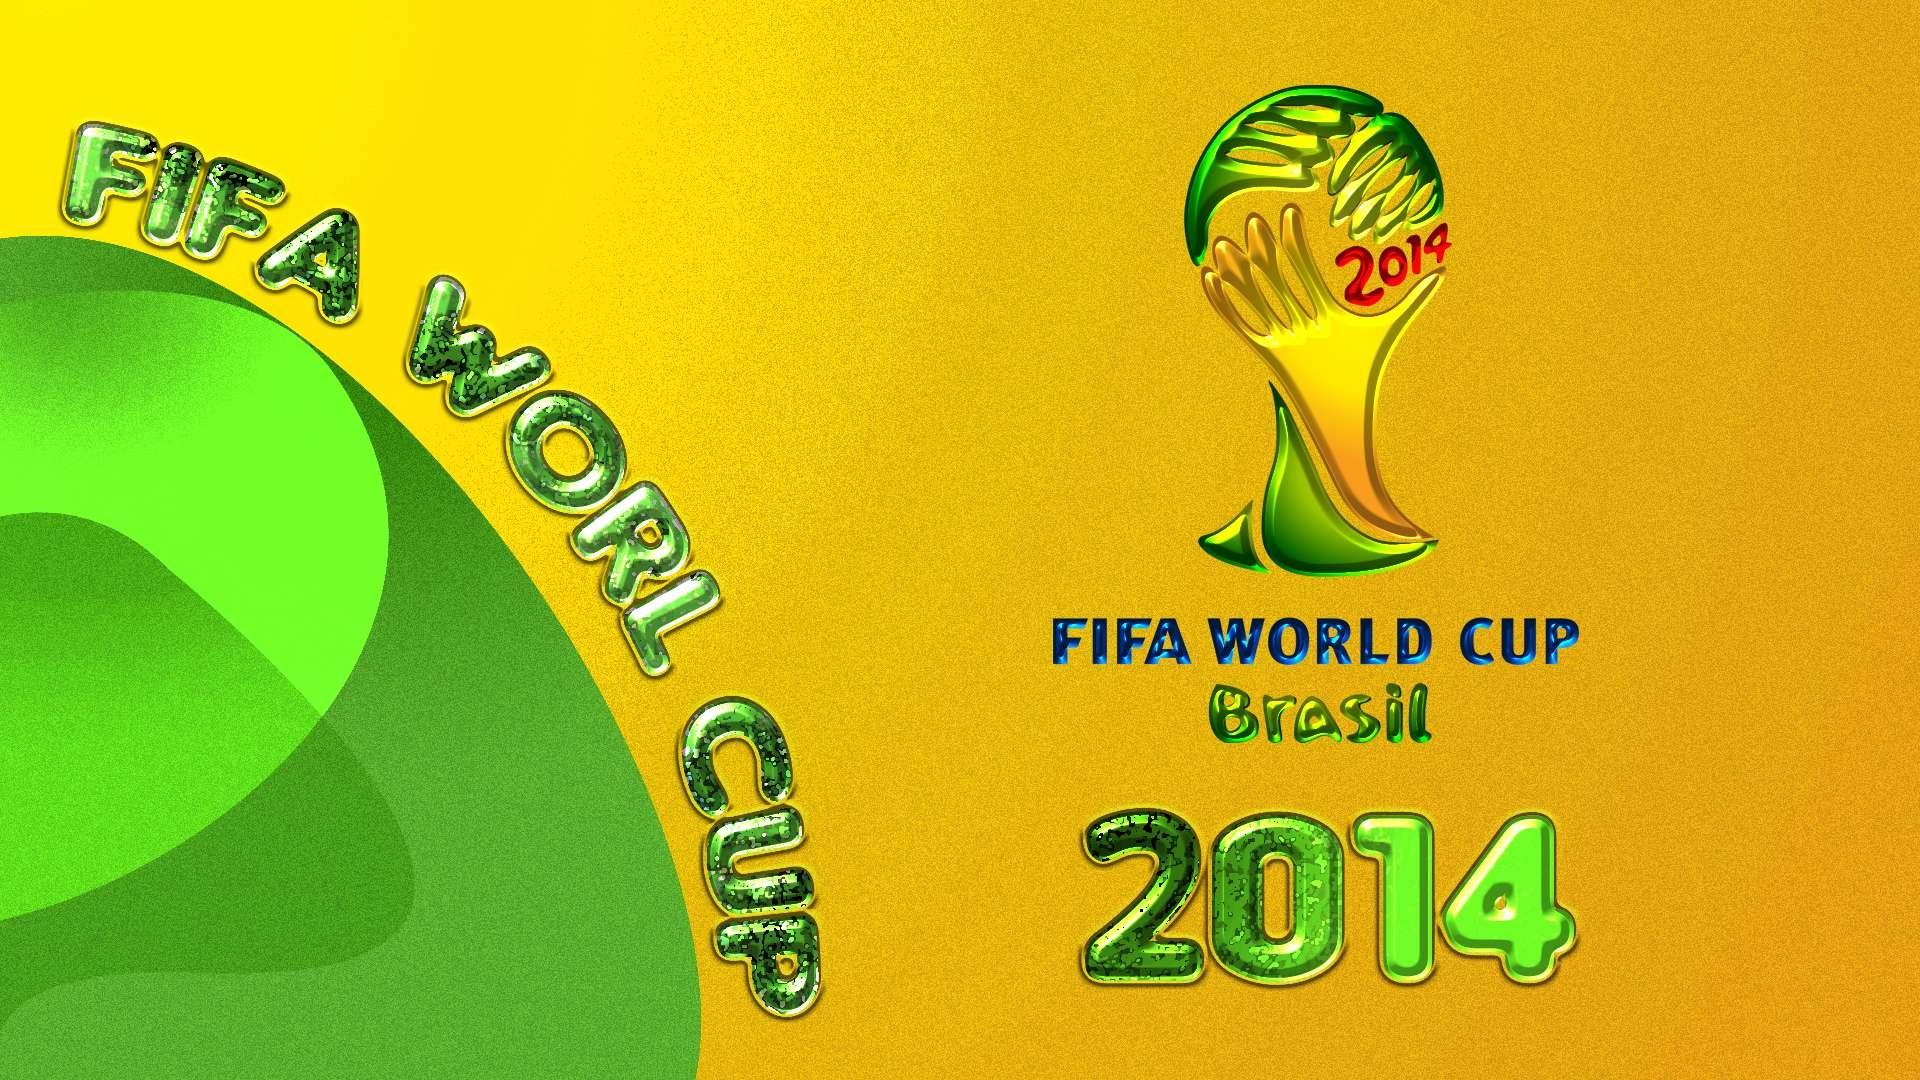 Fifa-WM-2014-Logo-HD-wallpaper